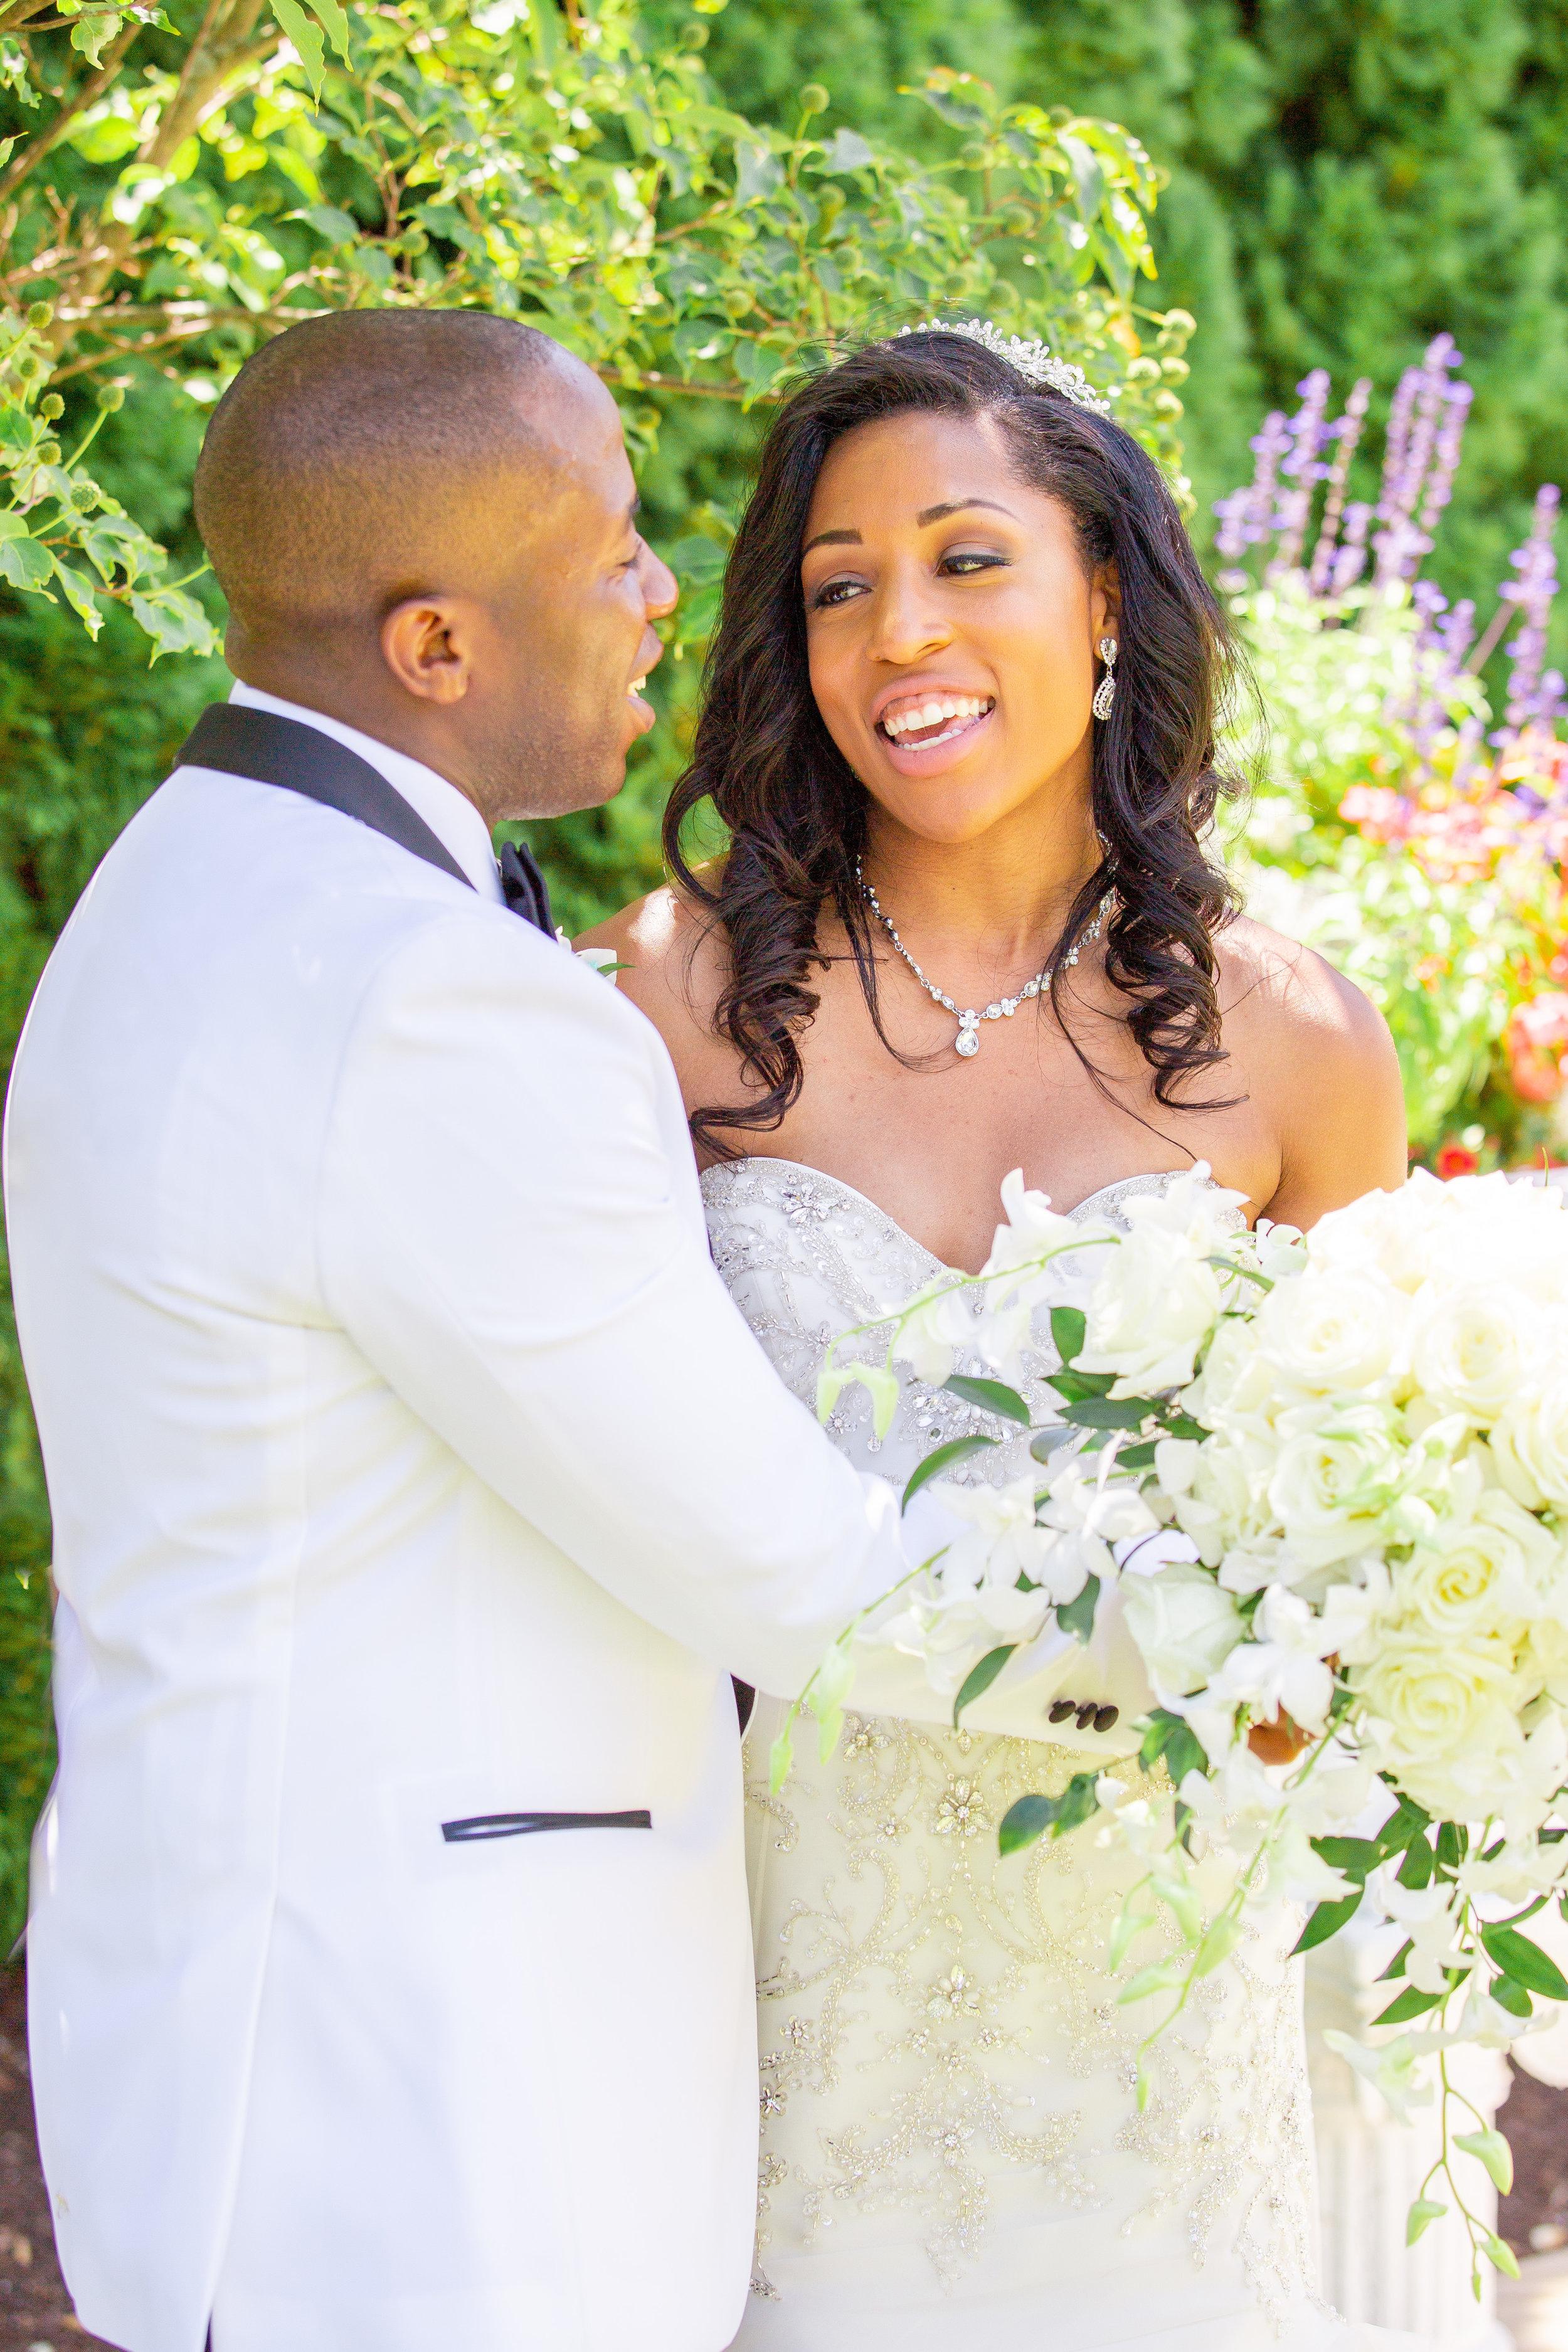 CONNECTICUT-WEDDING-PHOTOGRAPHER-2.jpg